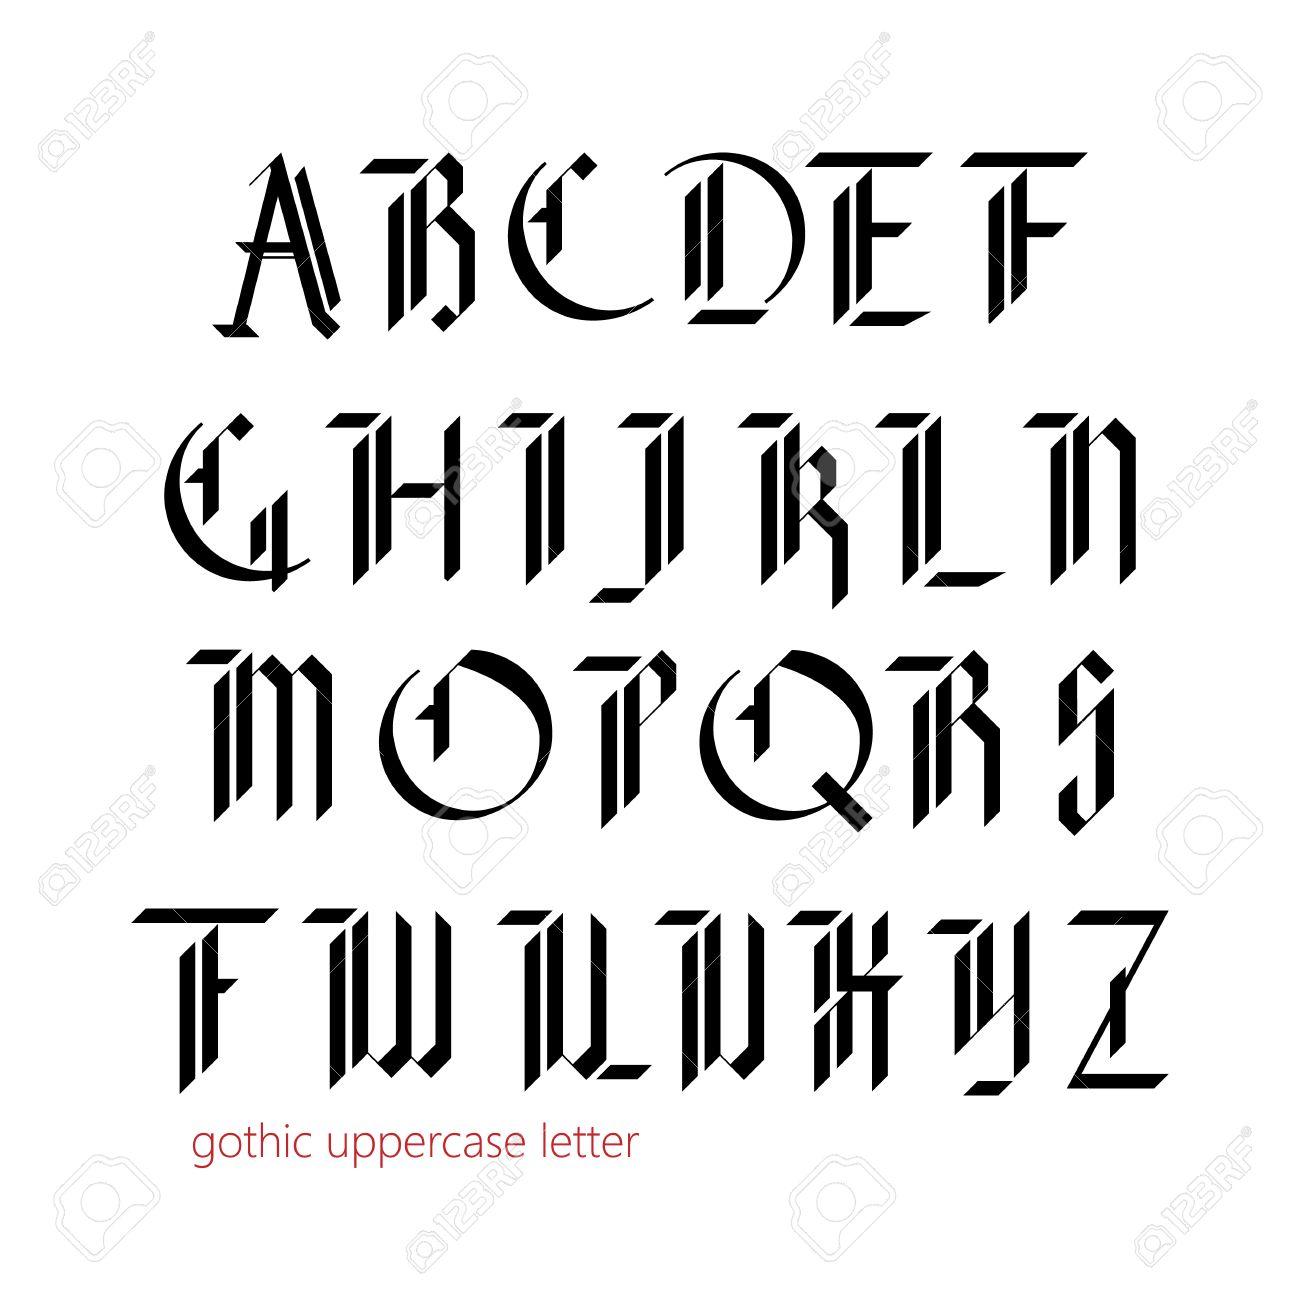 Blackletter Modern Gothic Font All Uppercase Letters Stock Vector